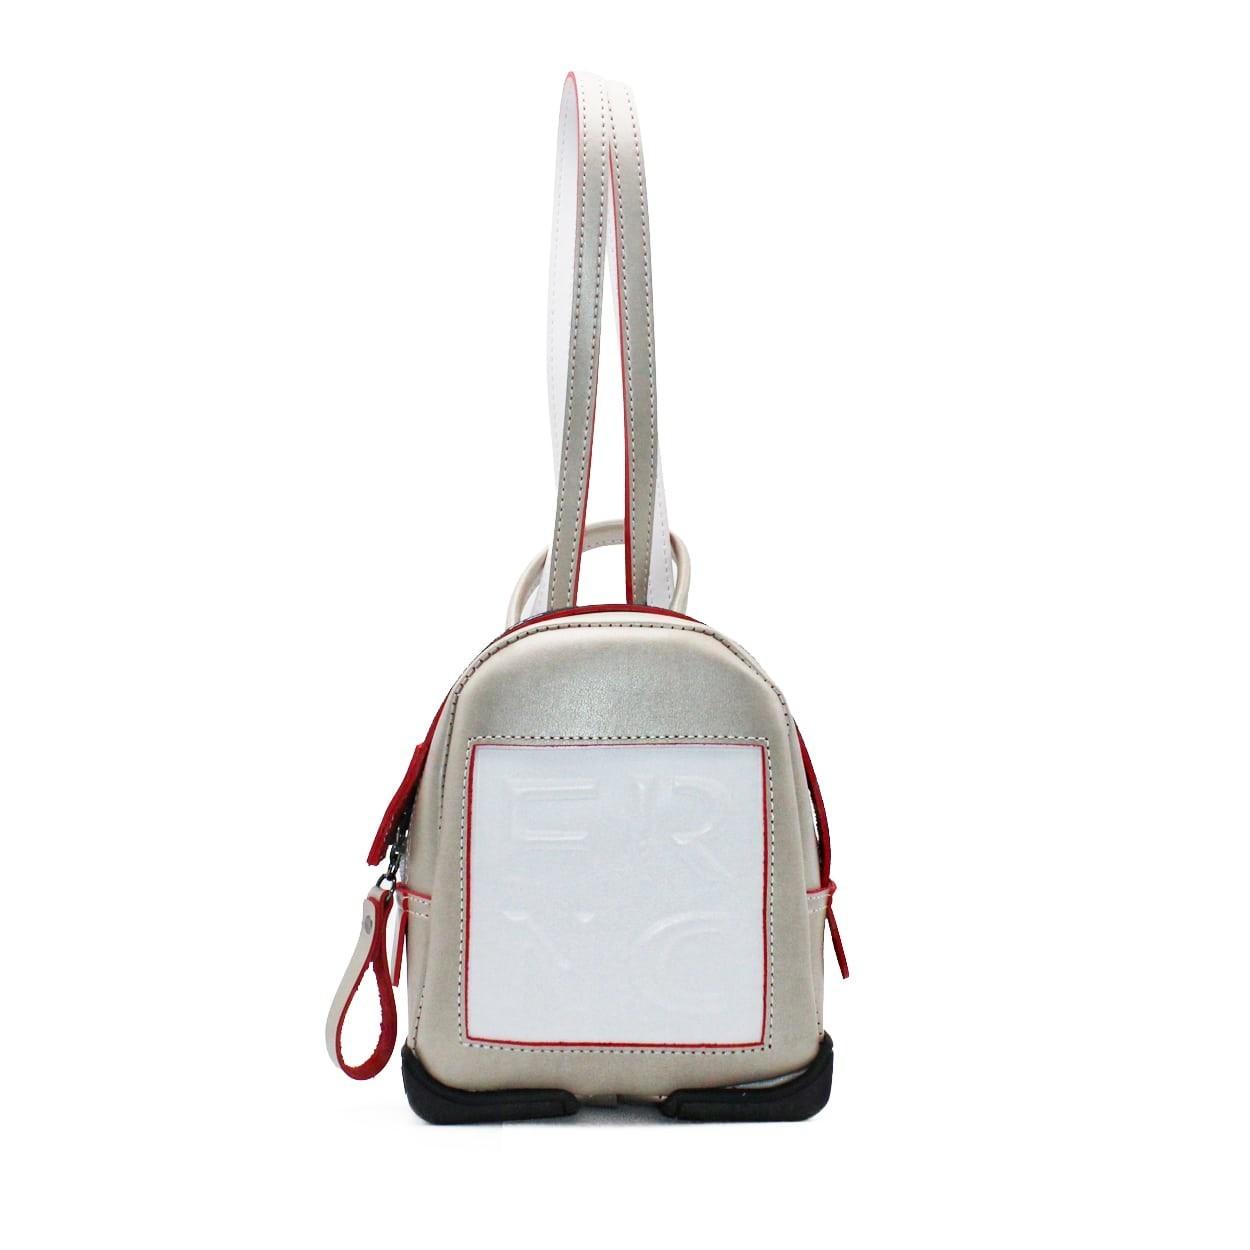 ac4573e996 FRNC FRANCESCO Τσάντα Γυναικεία Πλάτης-Backpack 2024 Πλατίνα Δέρμα ...